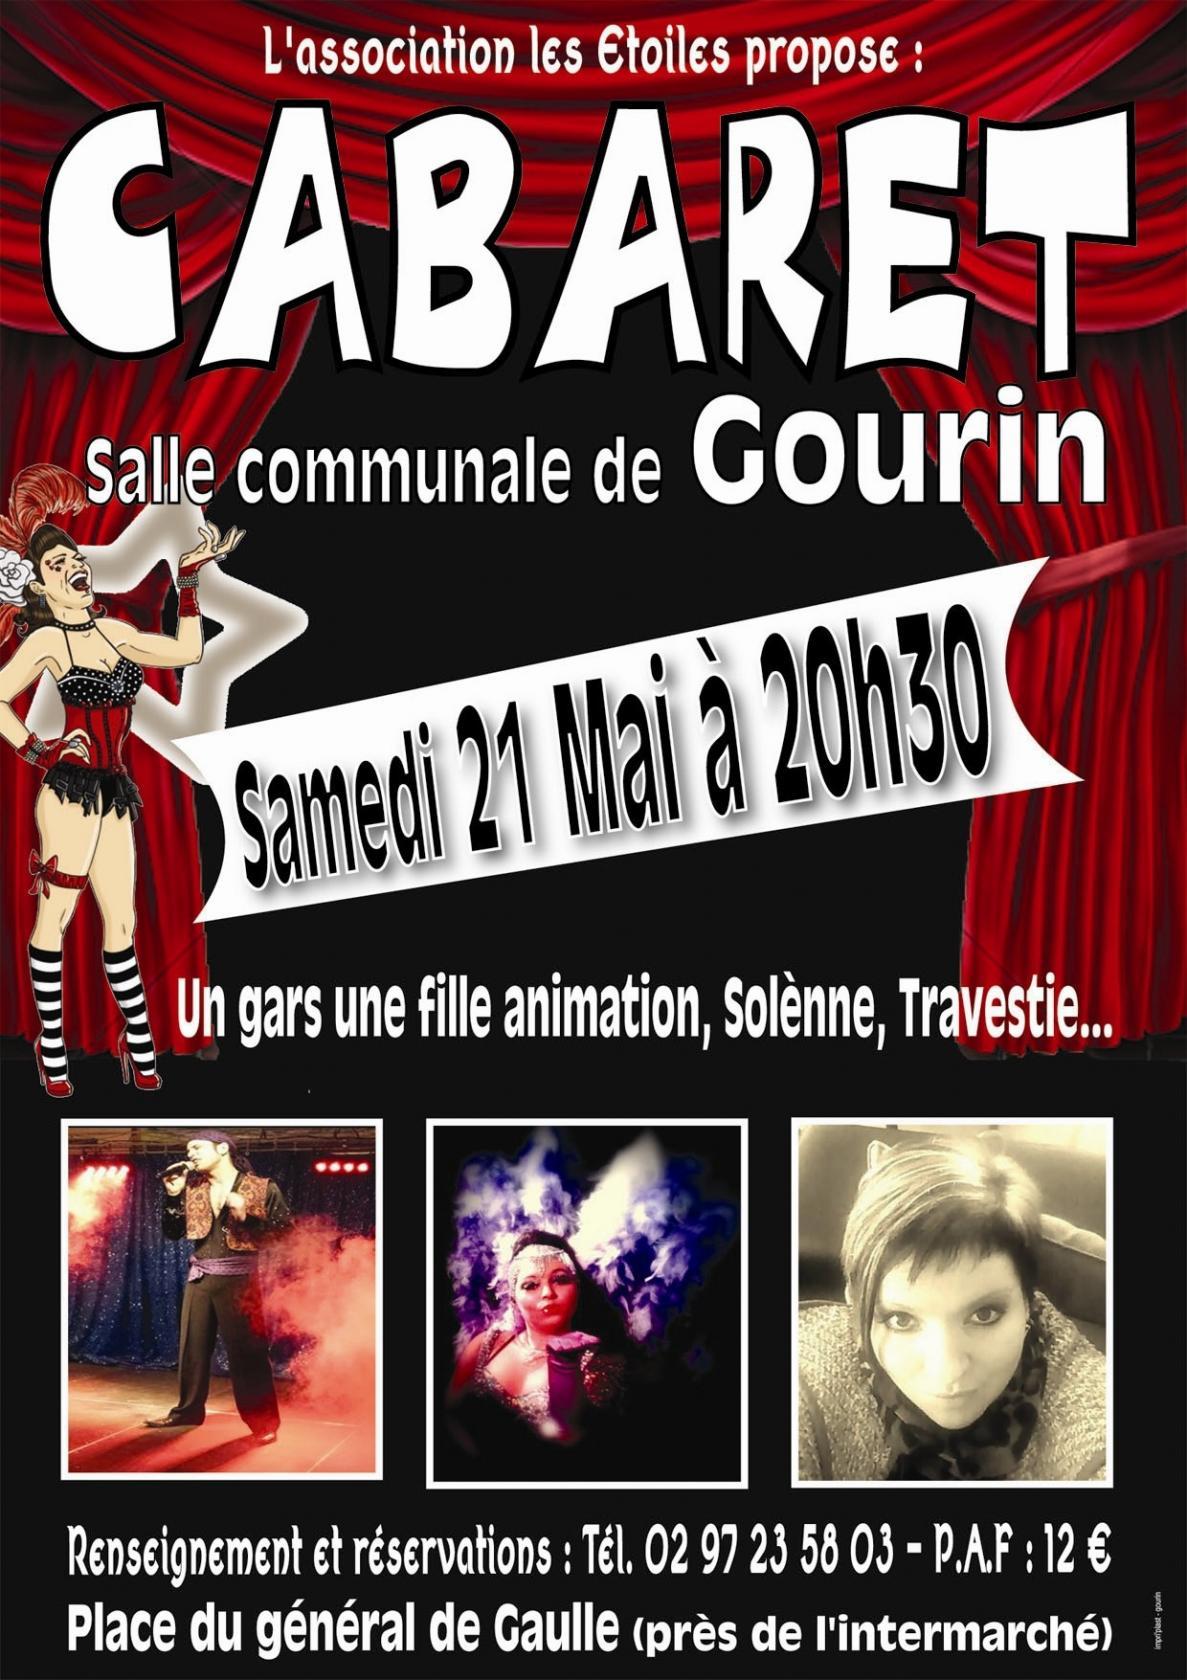 Cabaret Gourin